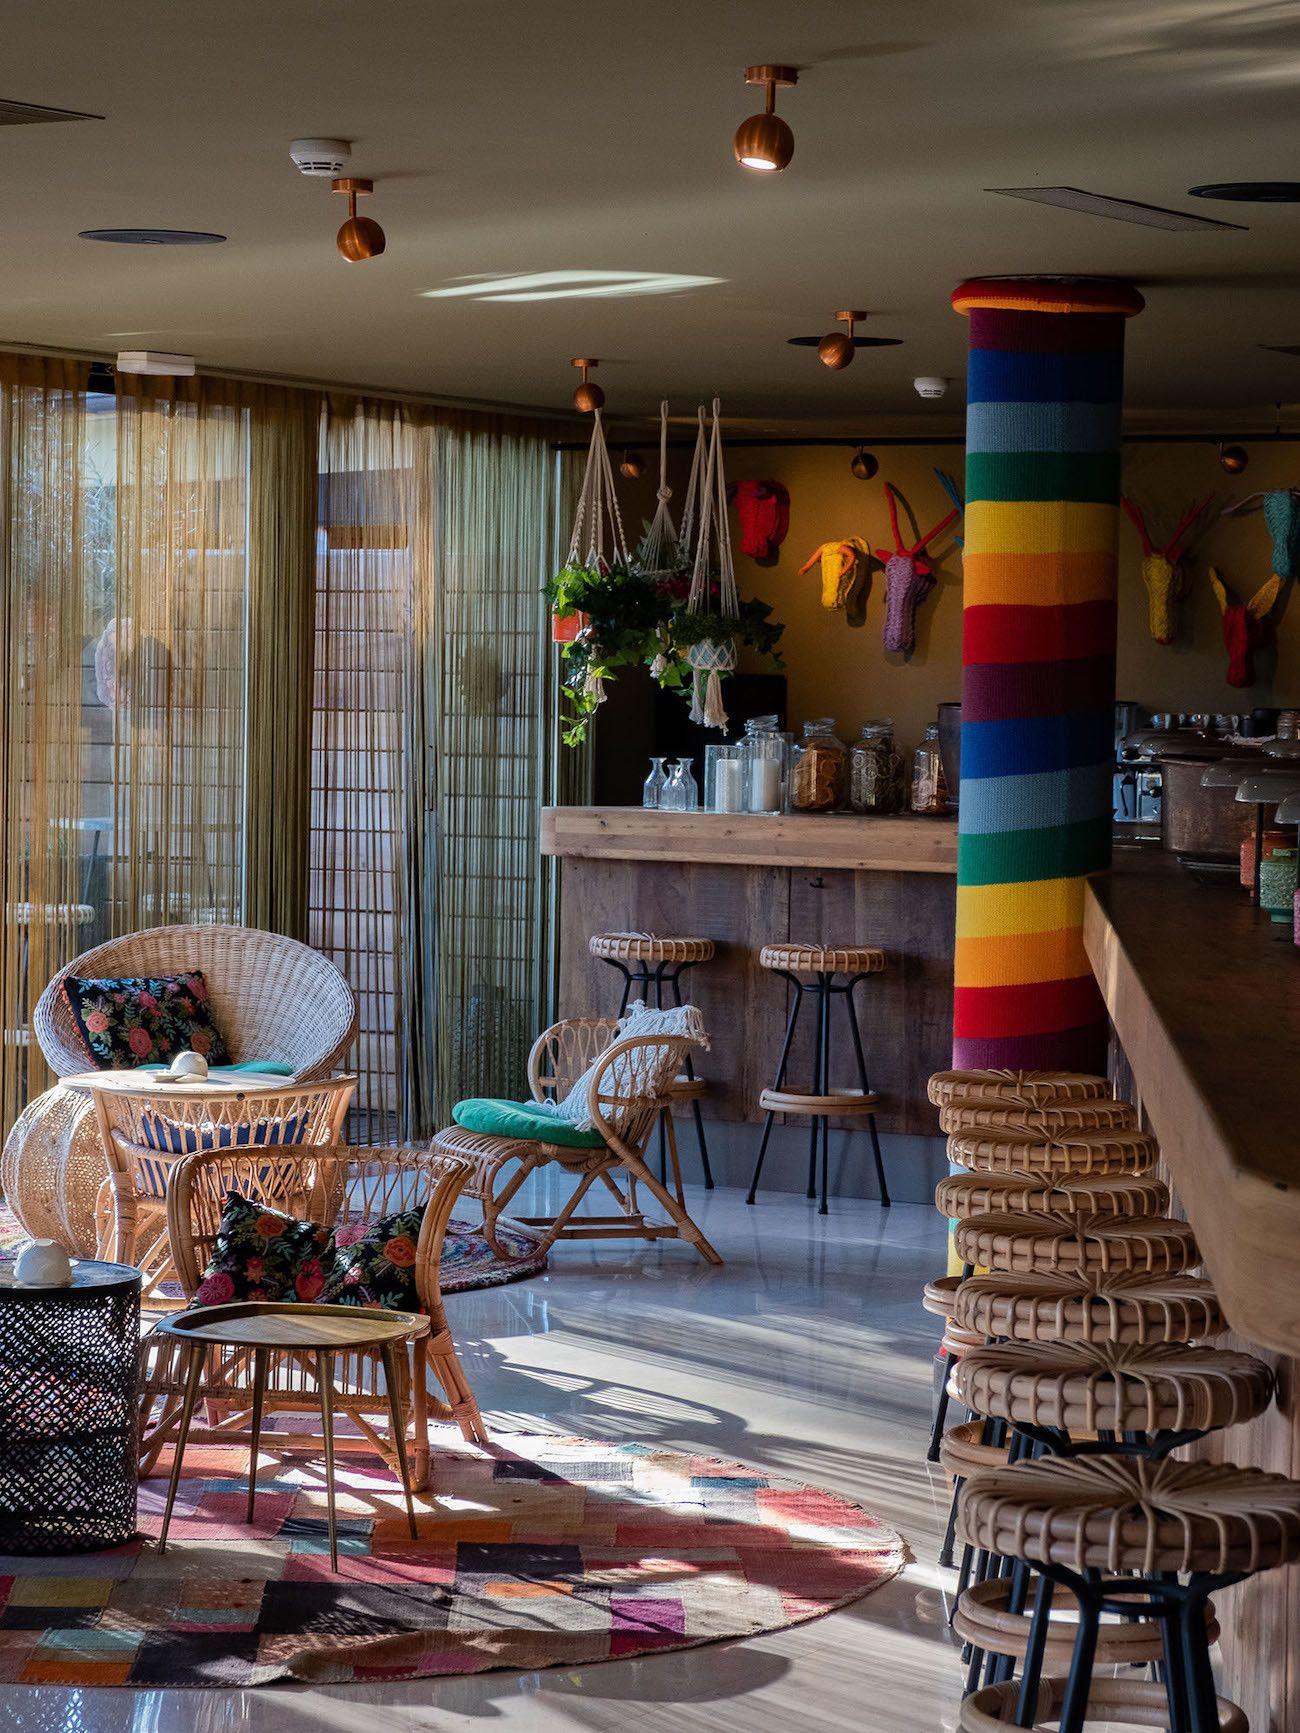 Foodblog About Fuel, Bikini Island & Mountain Hotels, Donkey Bar, Interieur